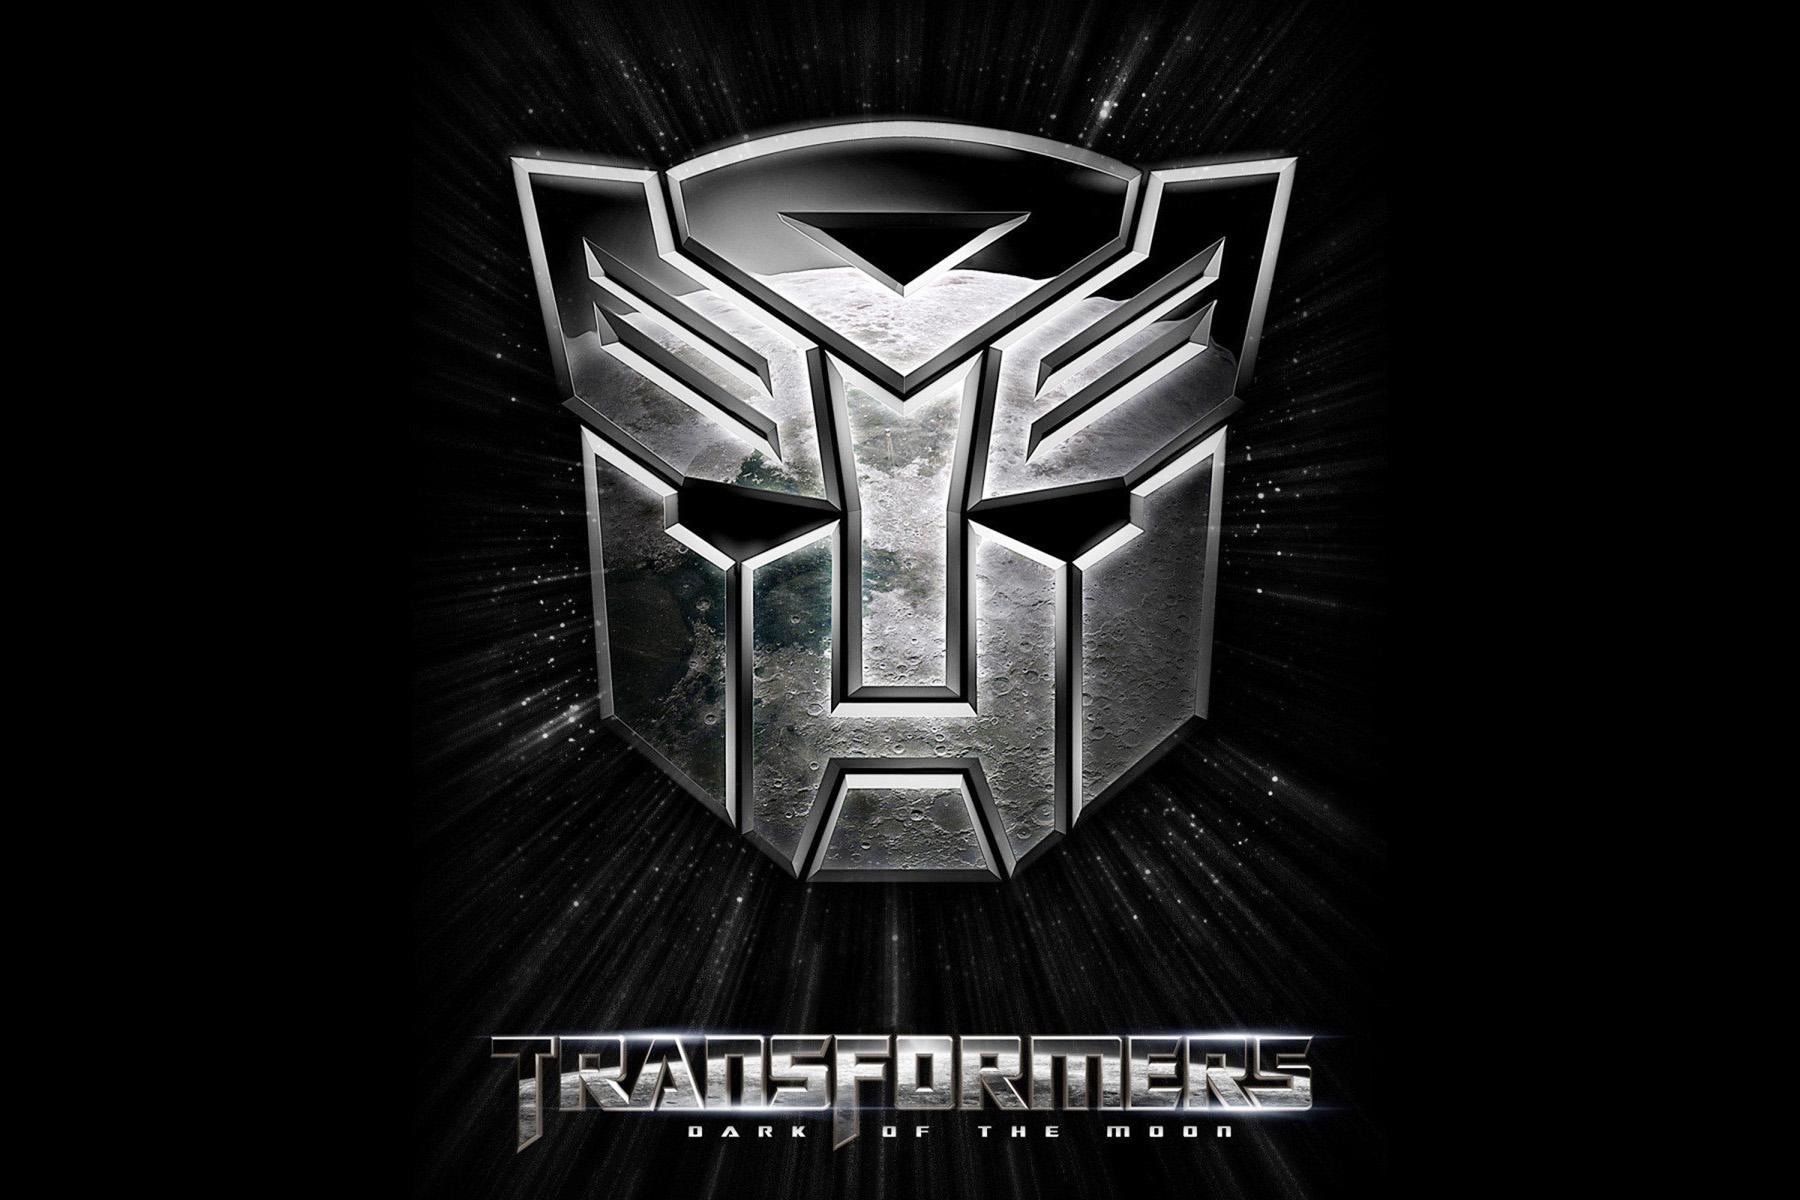 Winnipeg Jets Iphone Wallpaper Transformers 3 Dark Of The Moon Printable Trading Cards 6